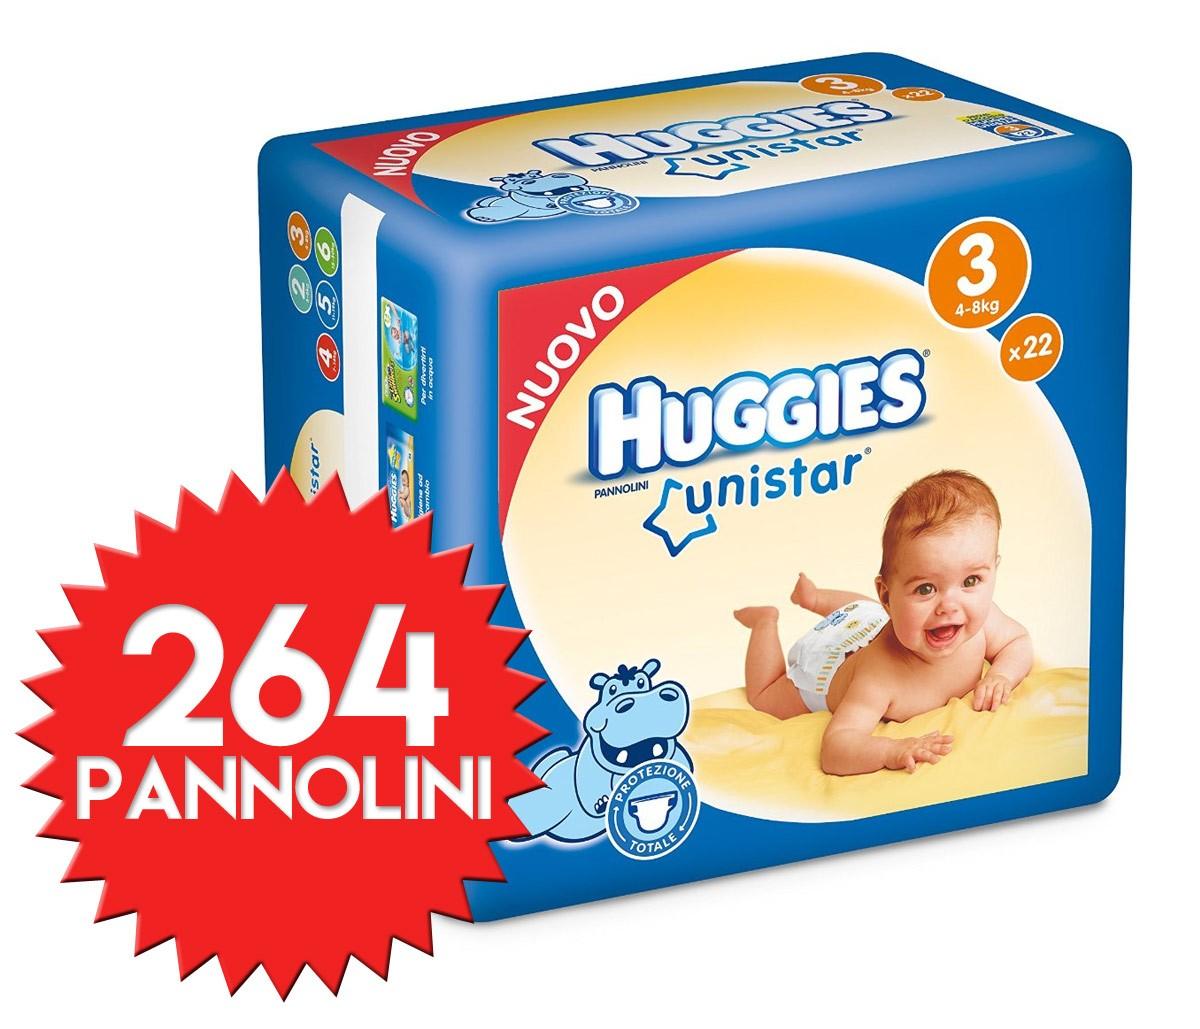 Pannolini Huggies Unistar Misura 3 - 264 pezzi